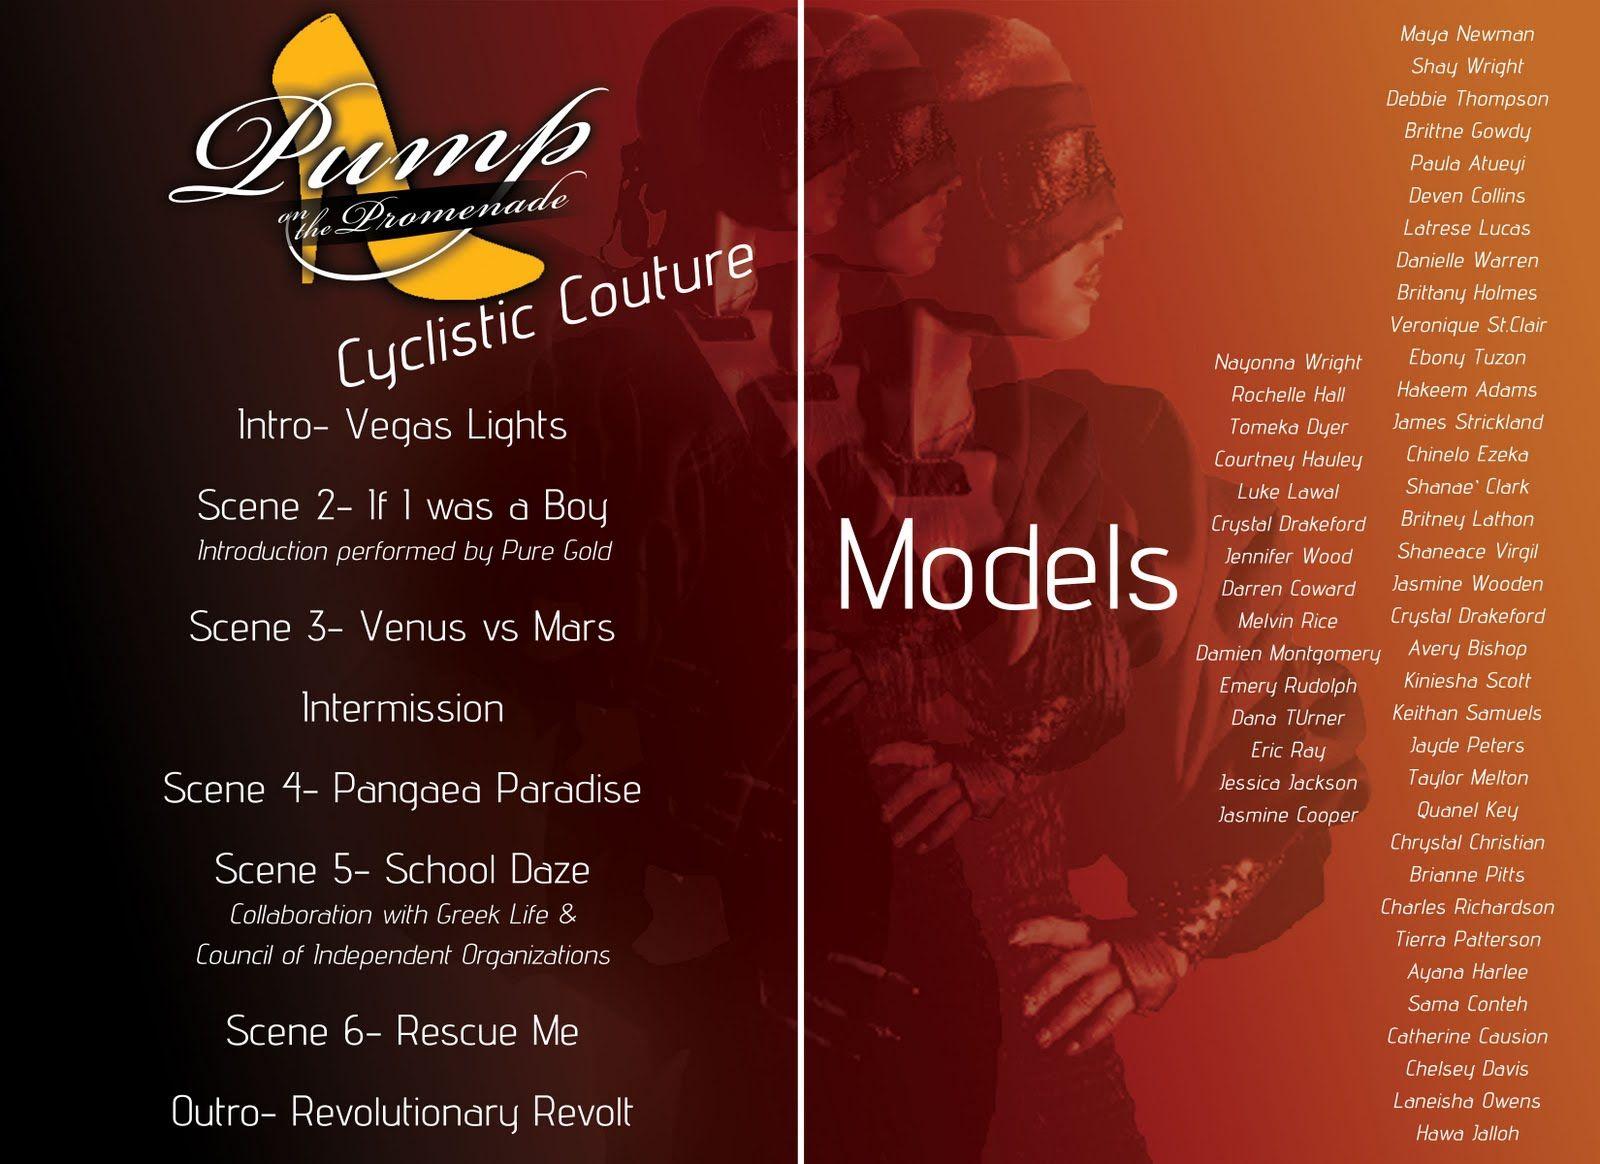 Order of program for church fashion show - Create Graphic Design Work Pump On The Promenade Fashion Show Program